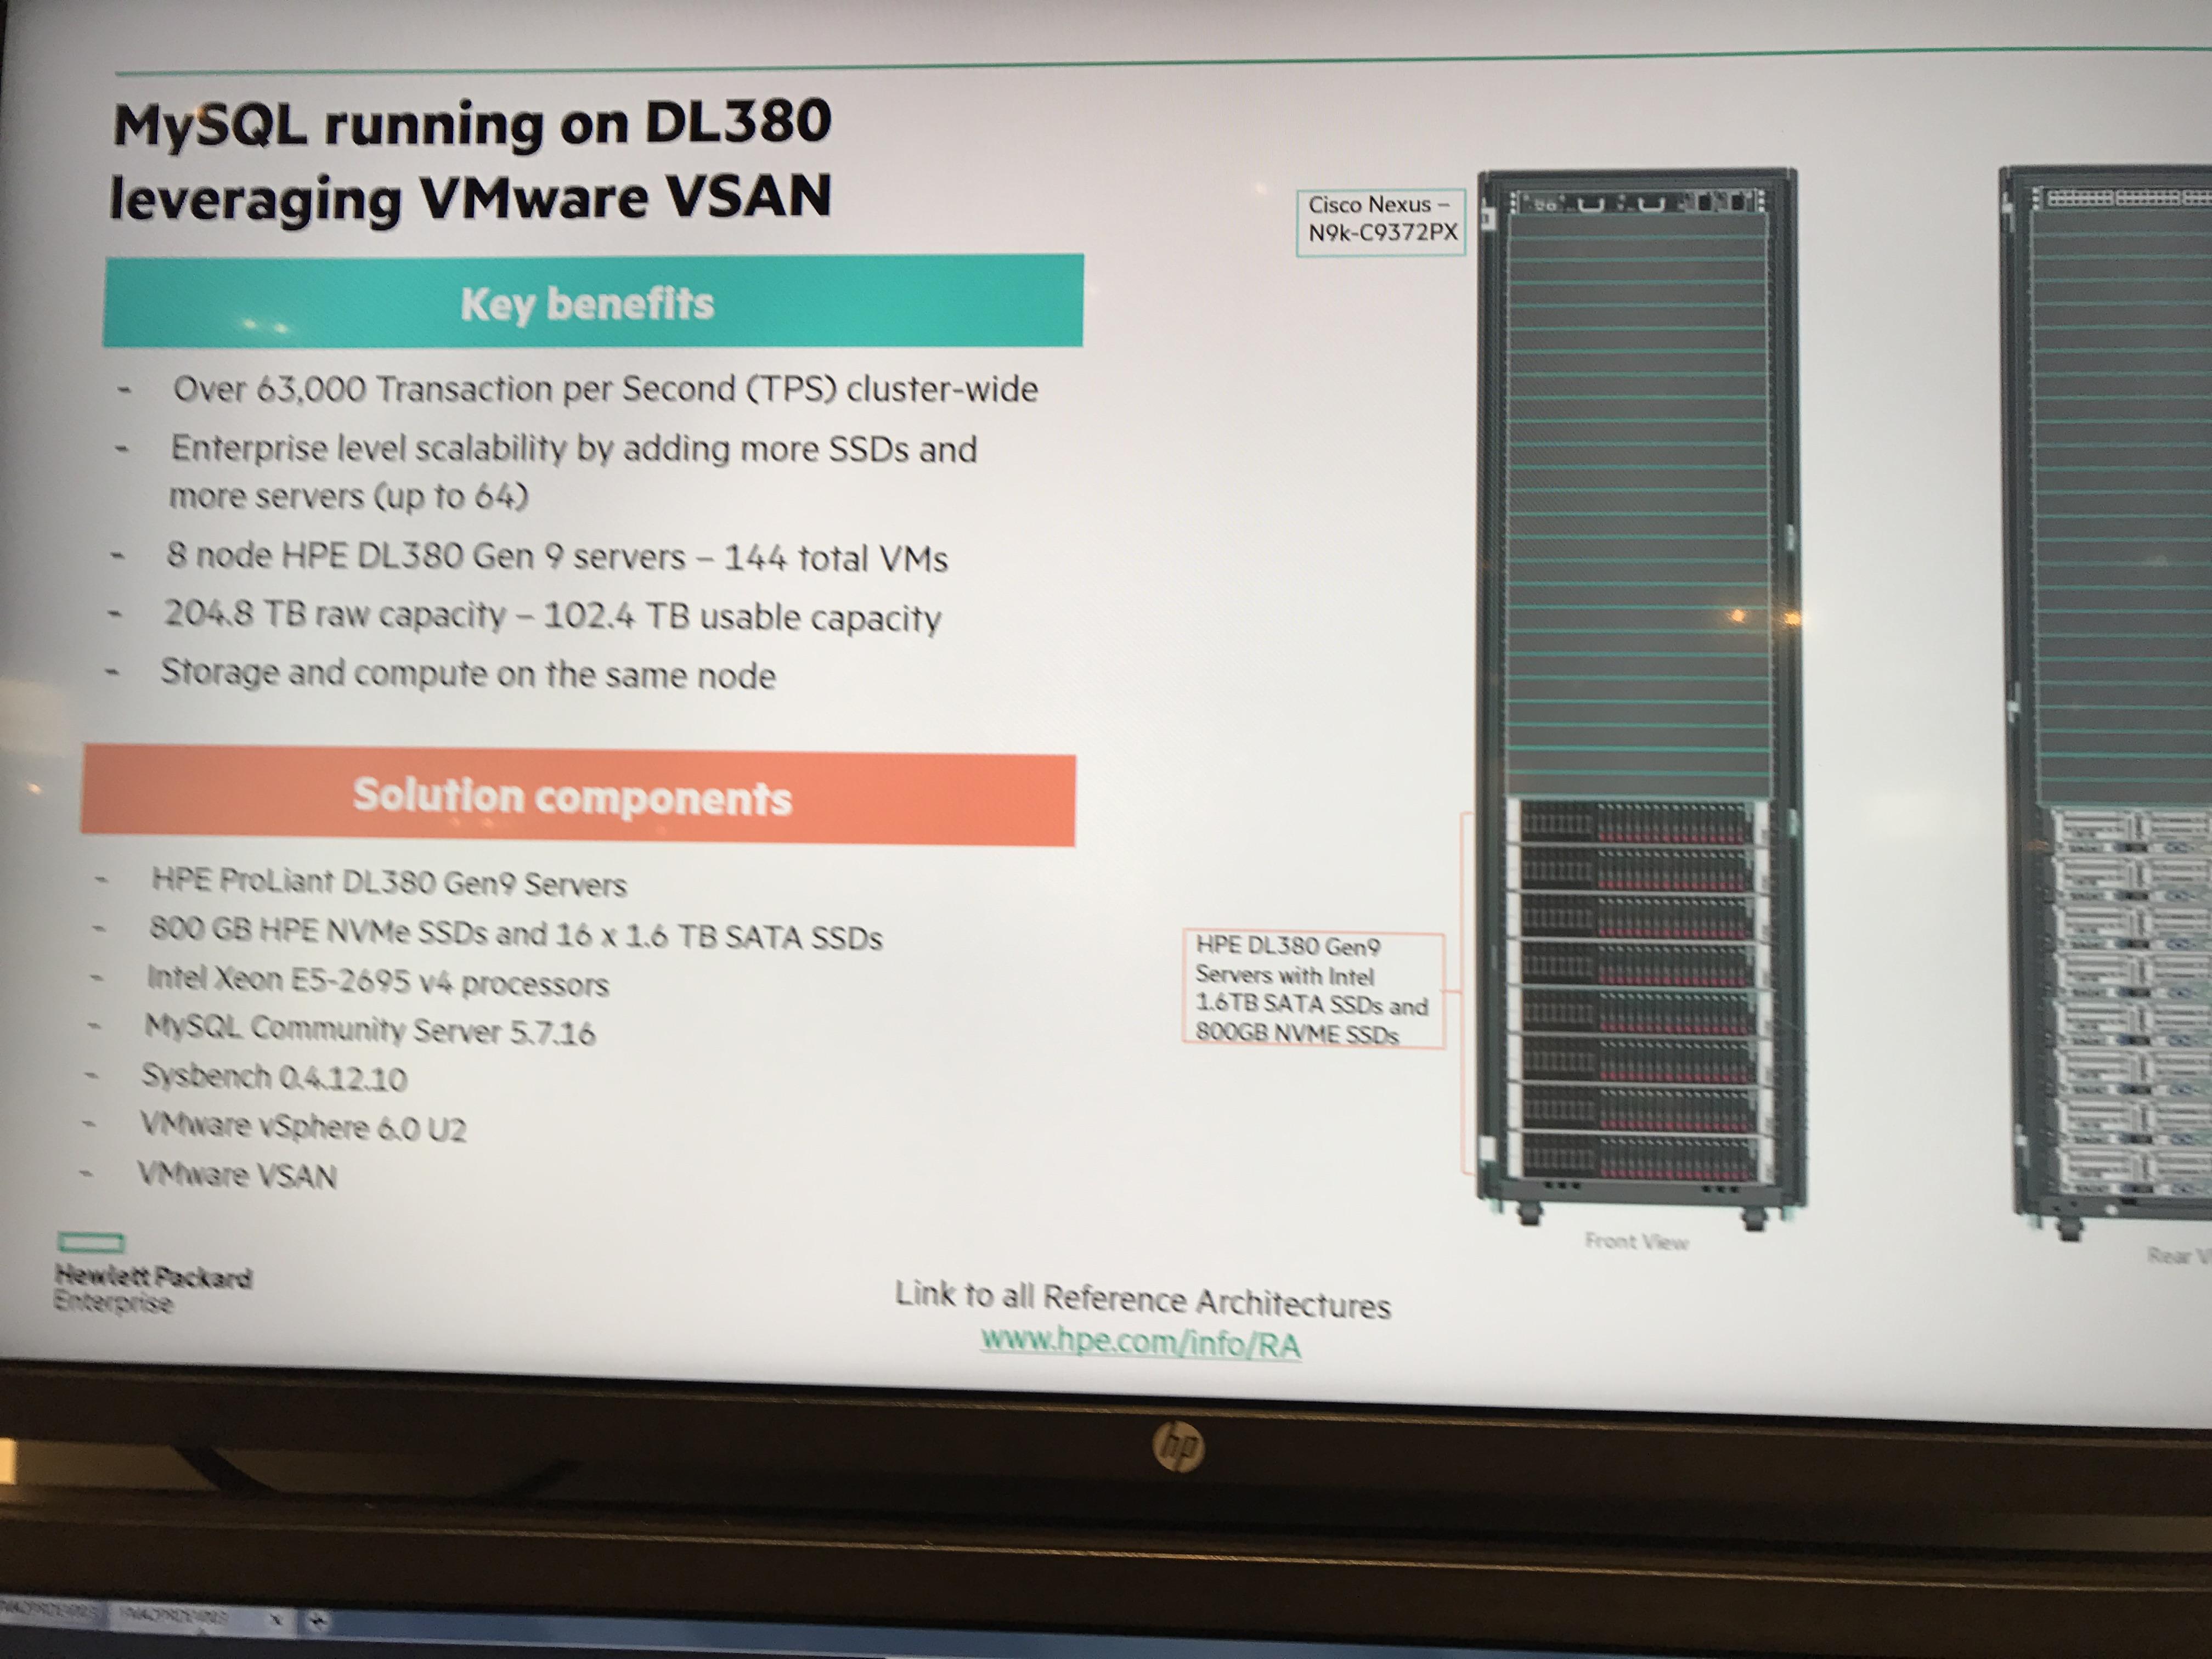 HPE DL380 VMware vSAN running MYSQL